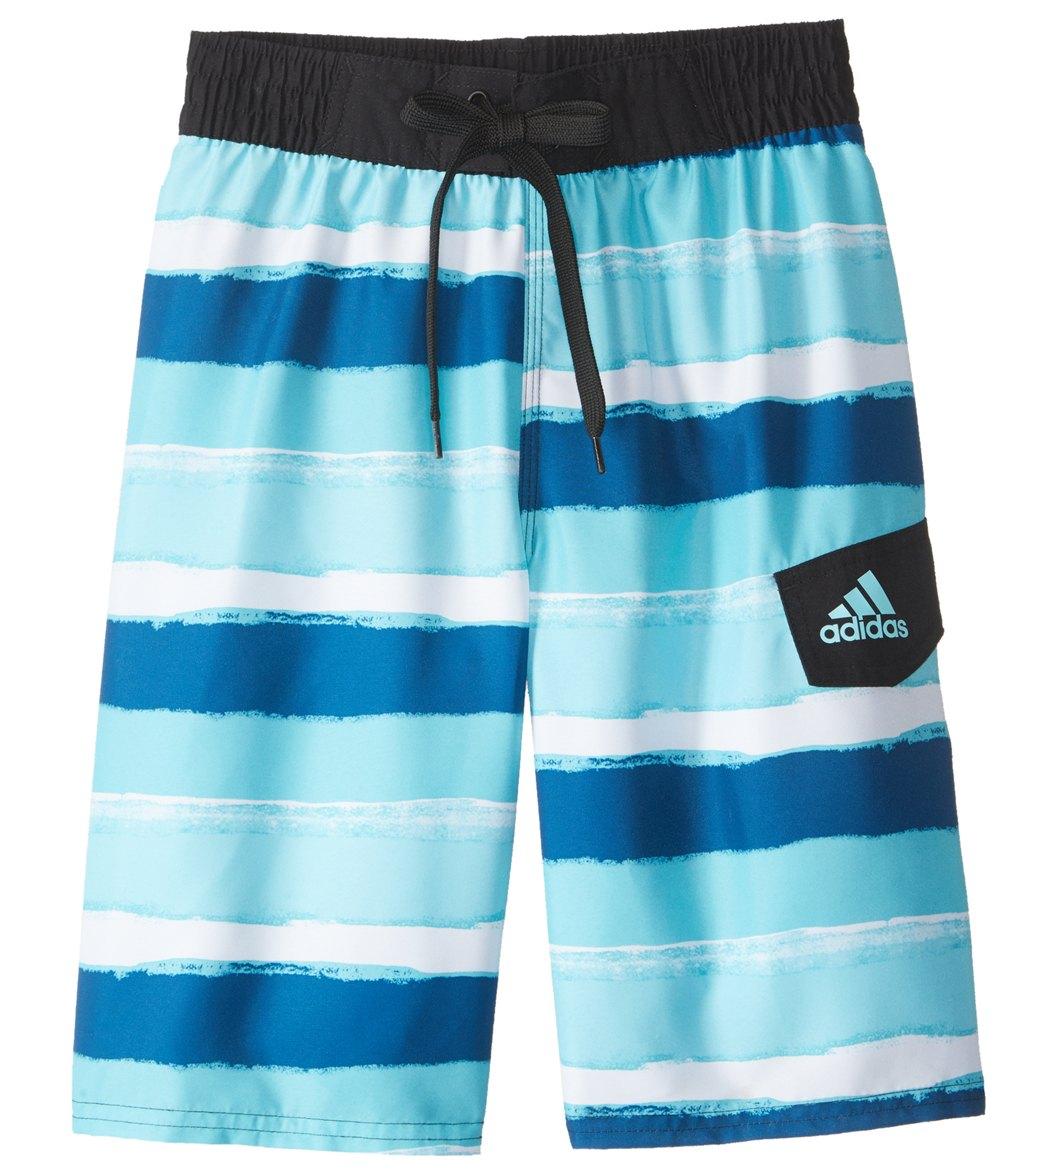 2cd01f6b38 Adidas Boys' Go On Stripe Swim Trunks (8-20) at SwimOutlet.com